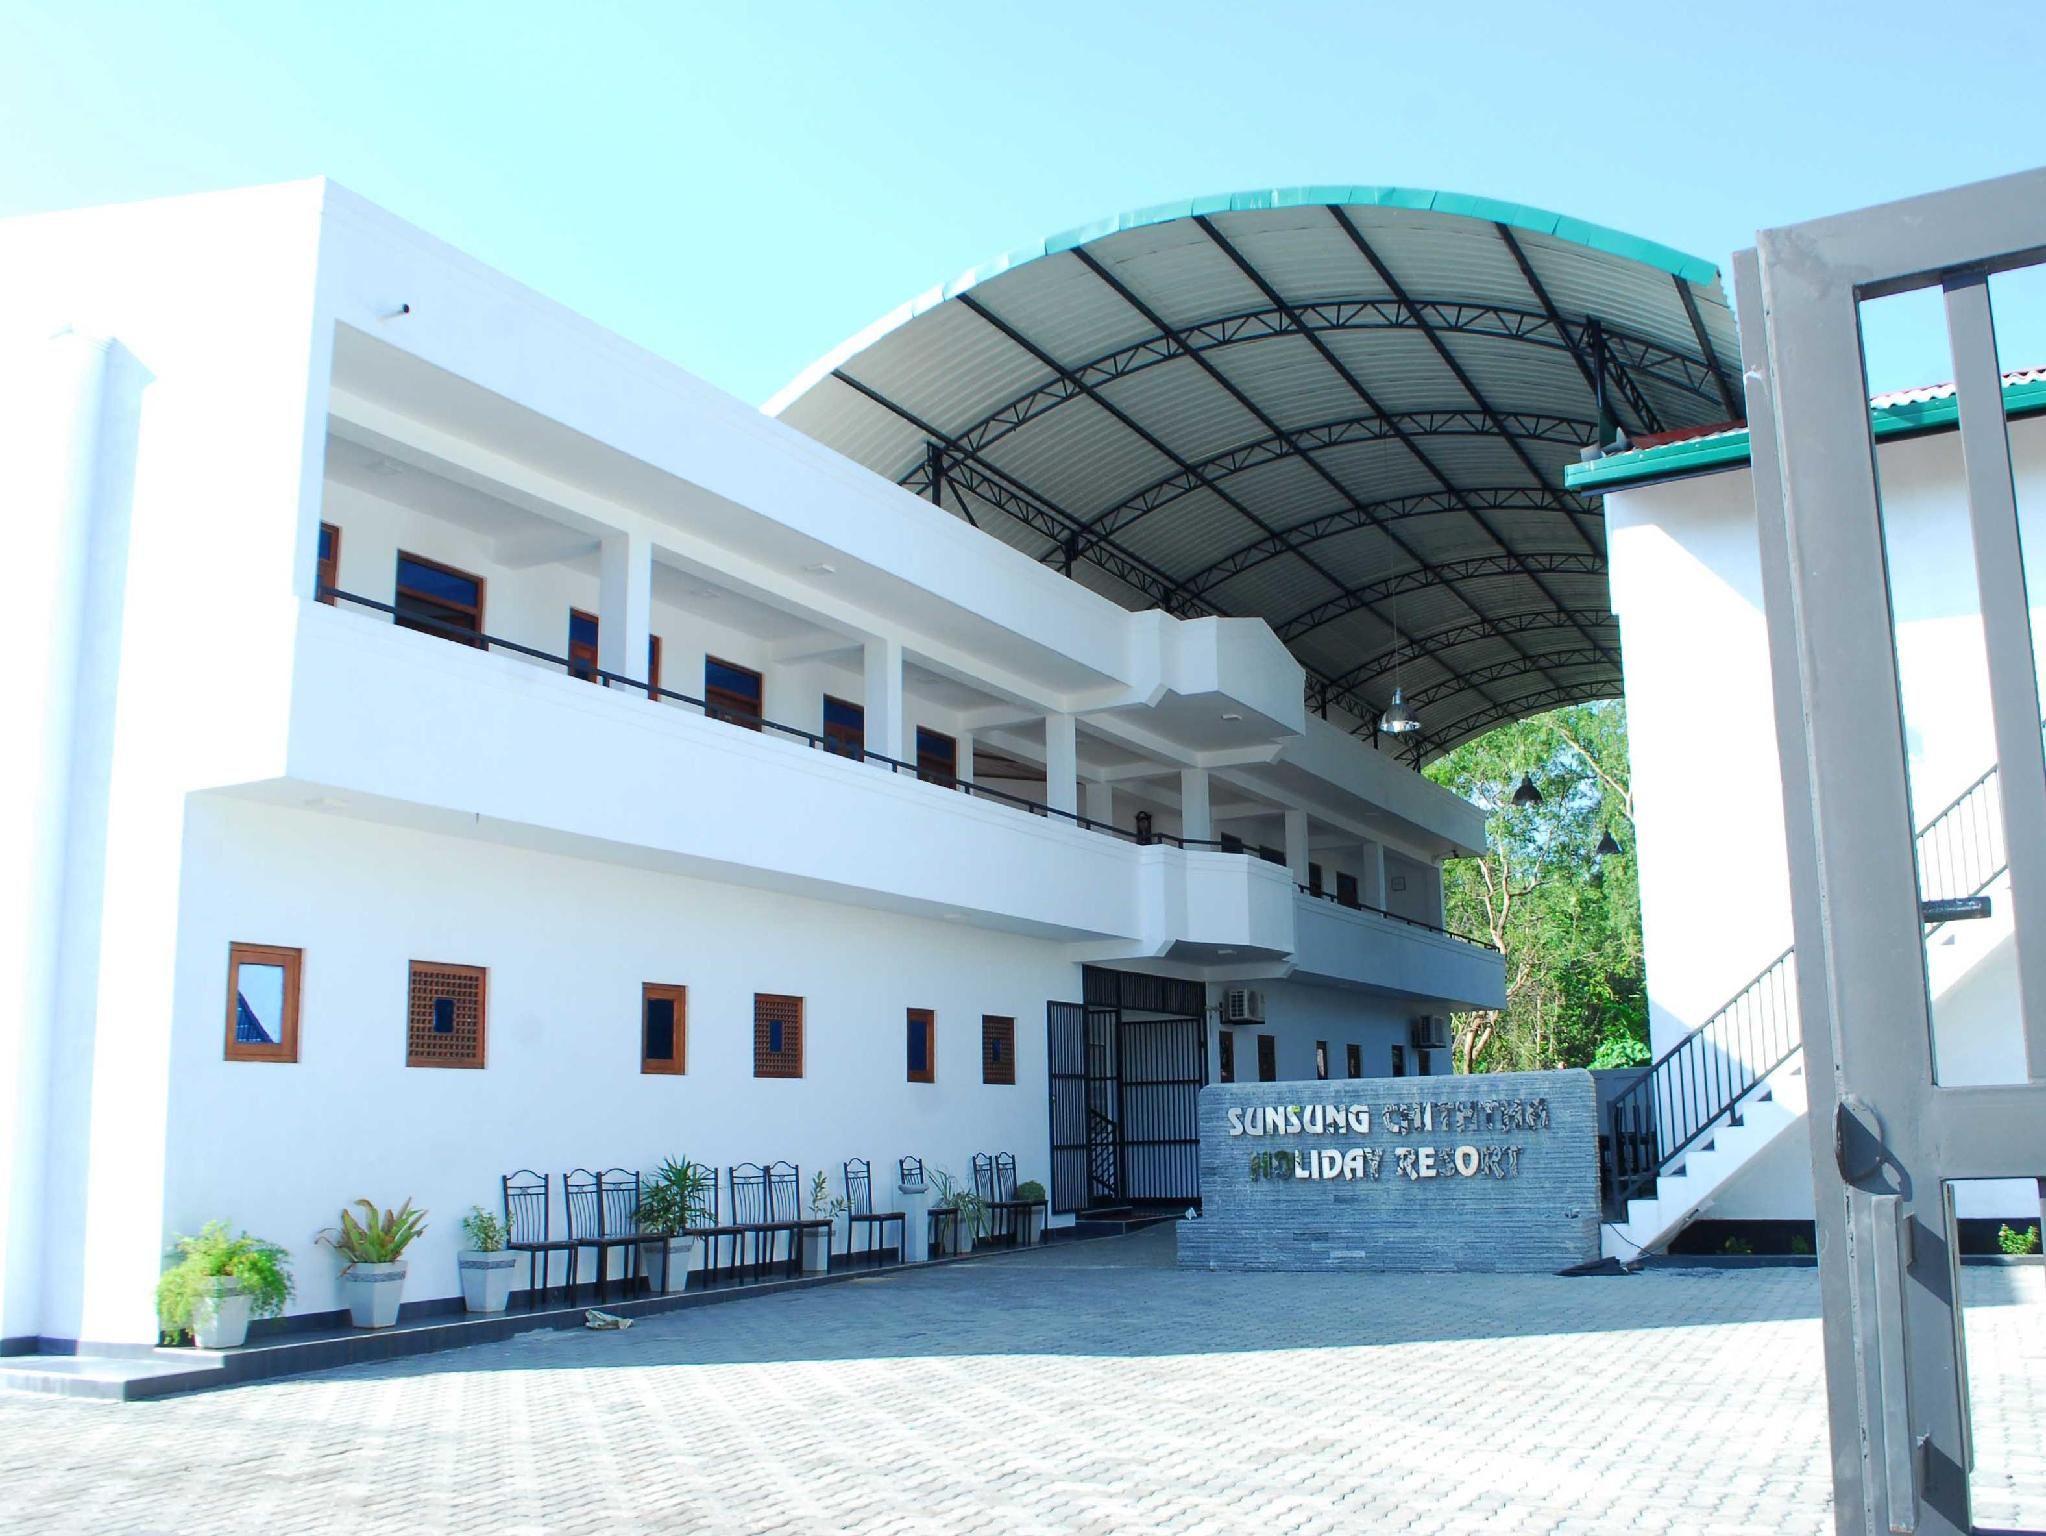 Sunsung Chiththa Holiday Resorts - Hotels and Accommodation in Sri Lanka, Asia